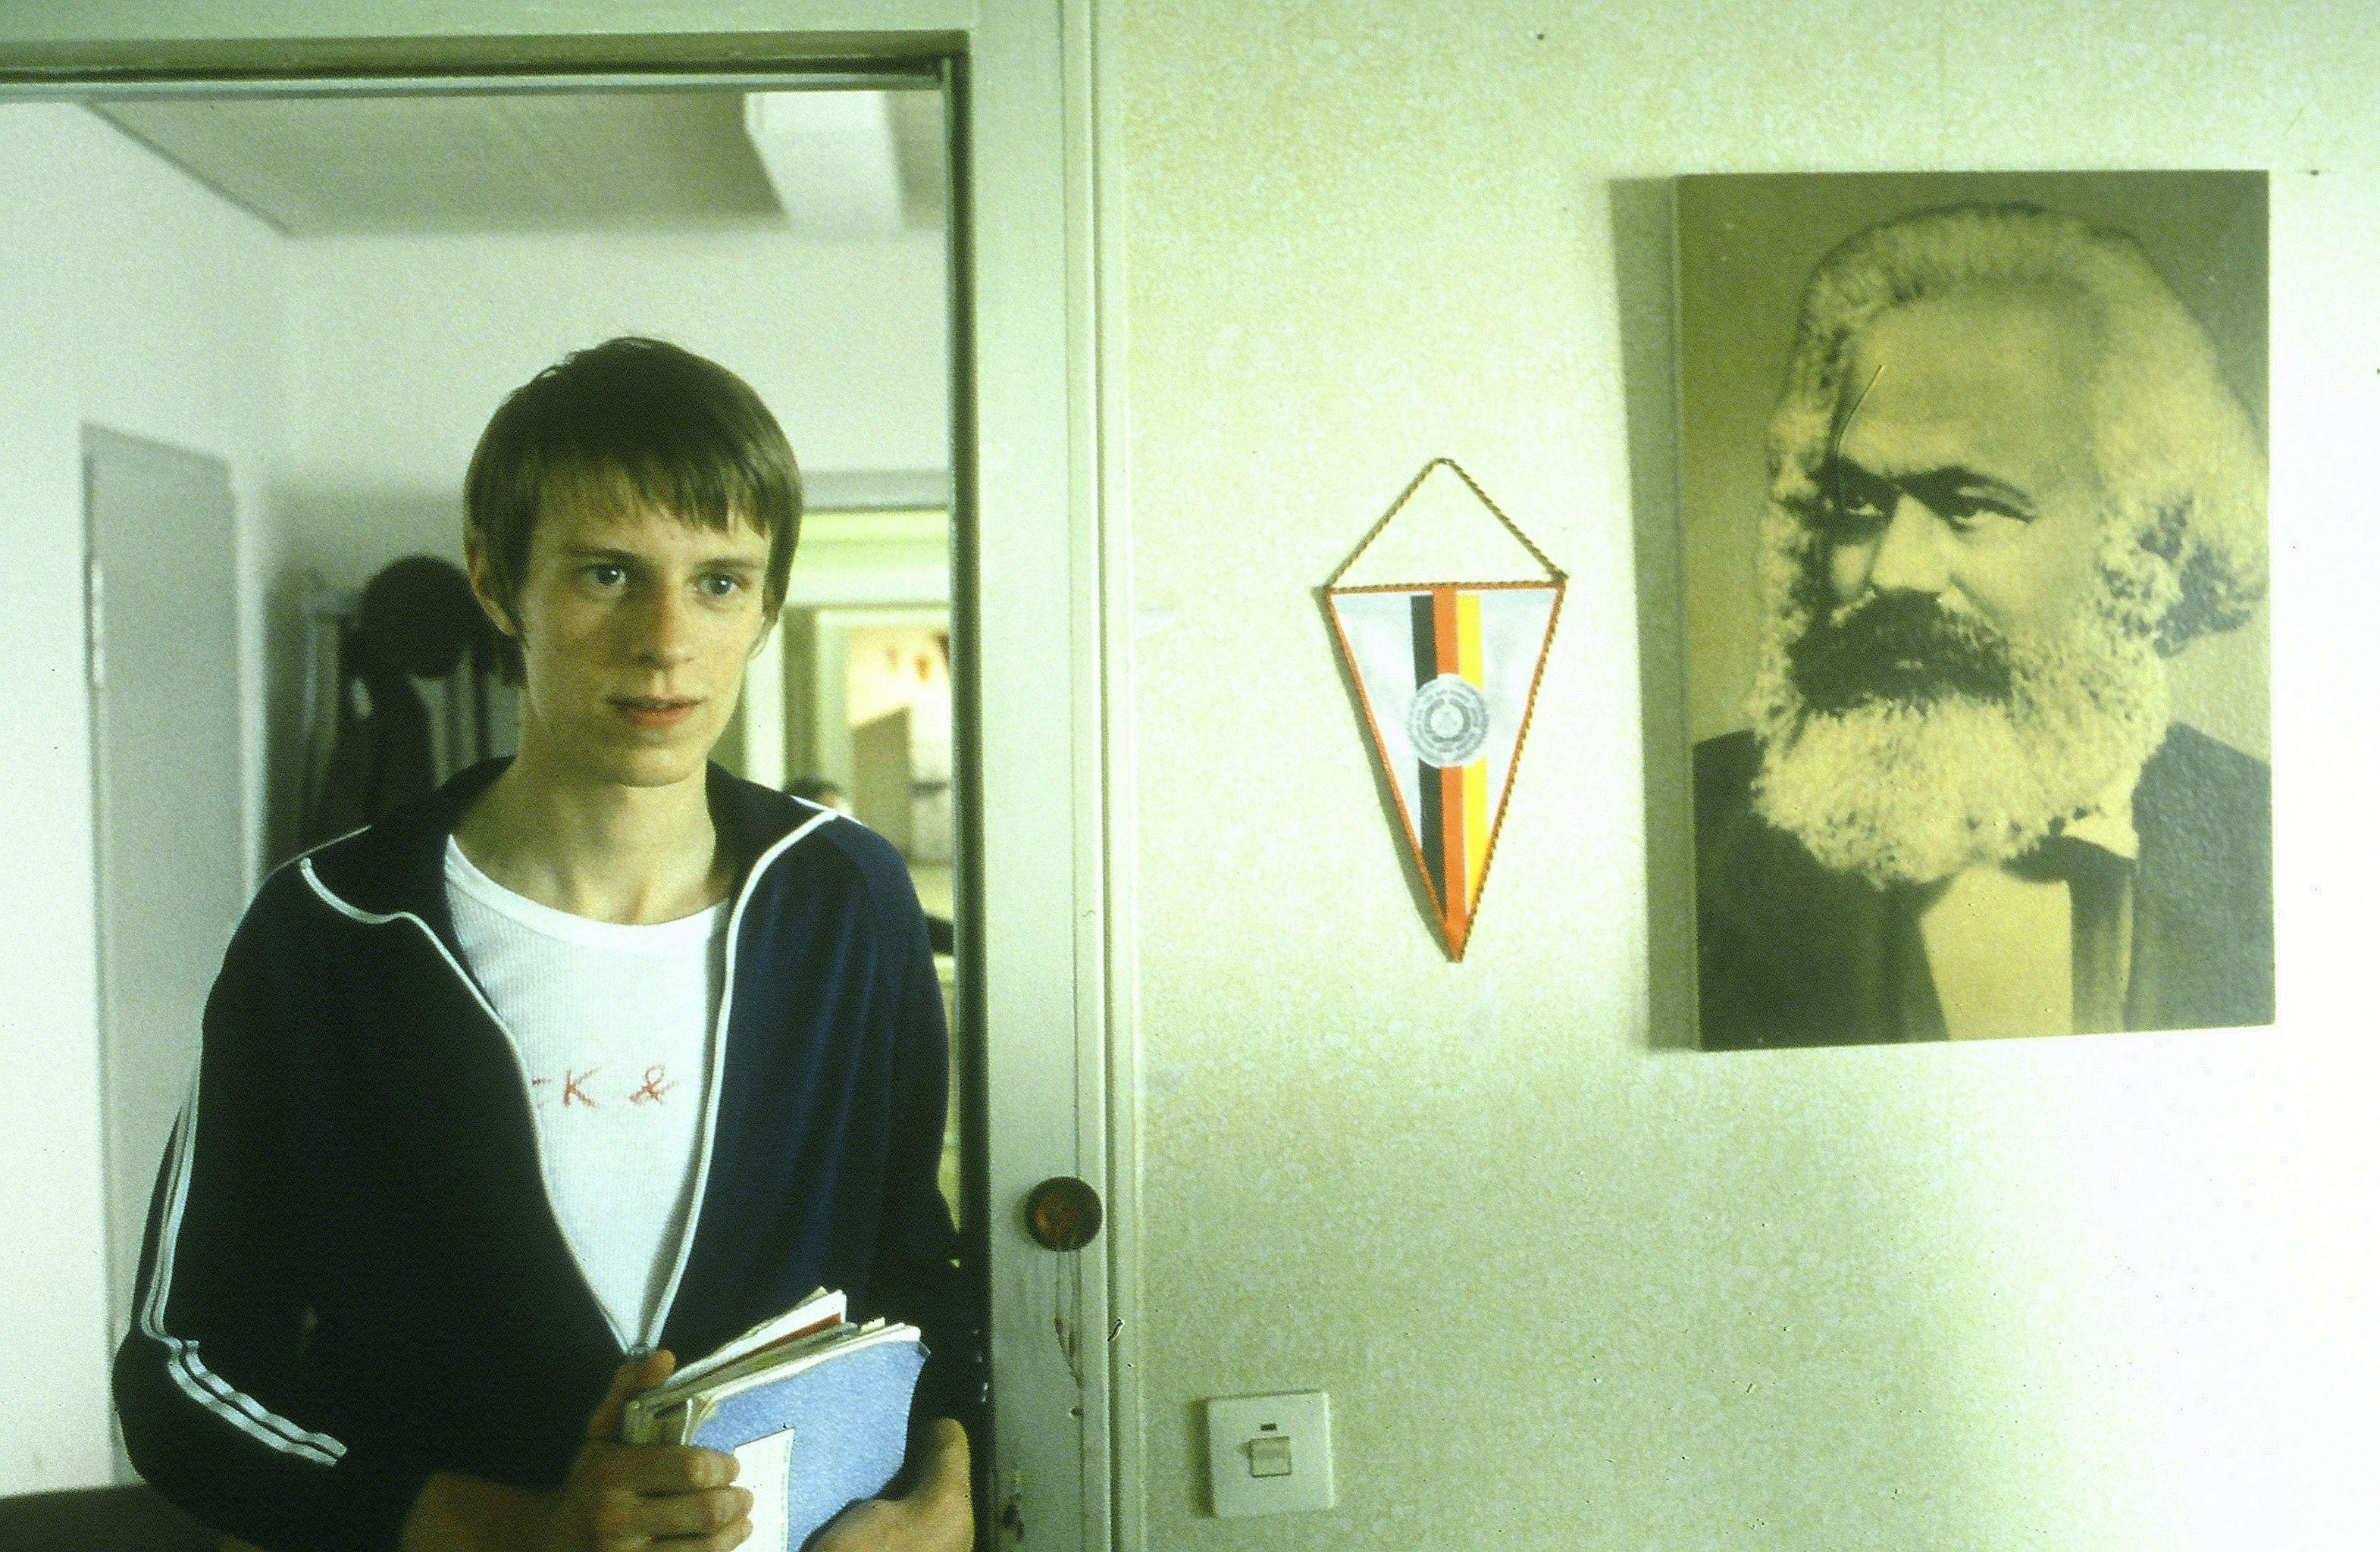 Karl Marx and Alexander Scheer in Sonnenallee (1999)